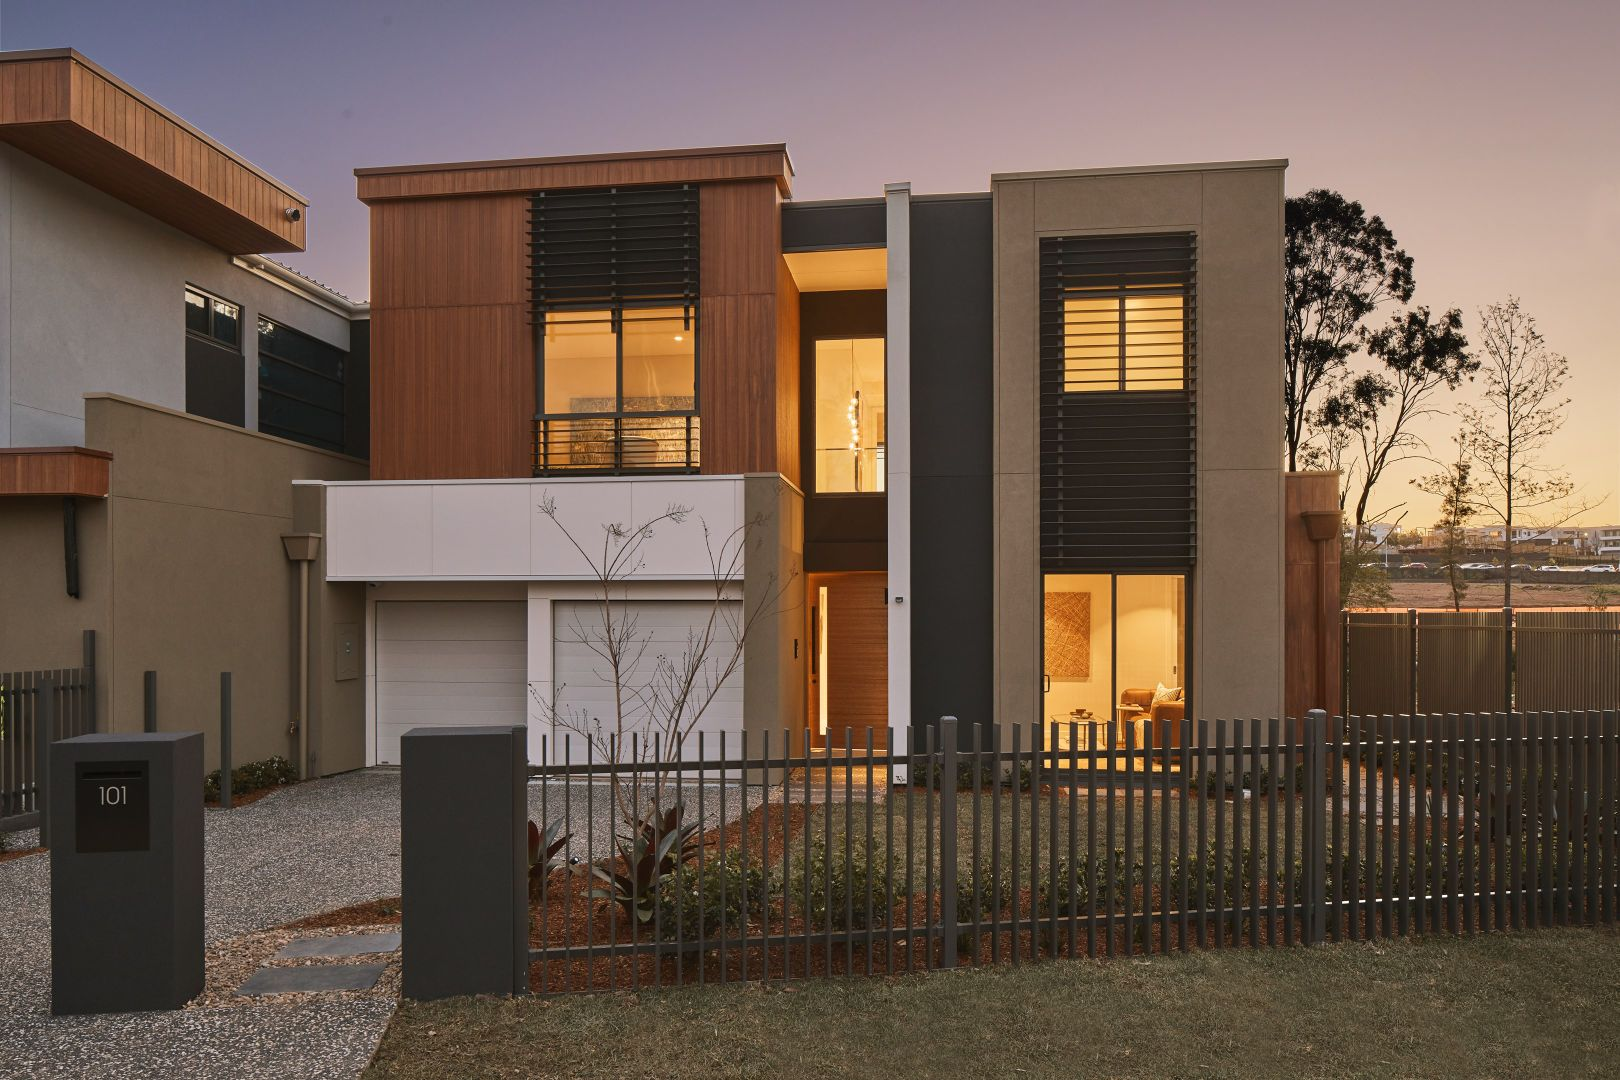 27 Fairway Drive, Bella Vista, NSW 2153, Image 0